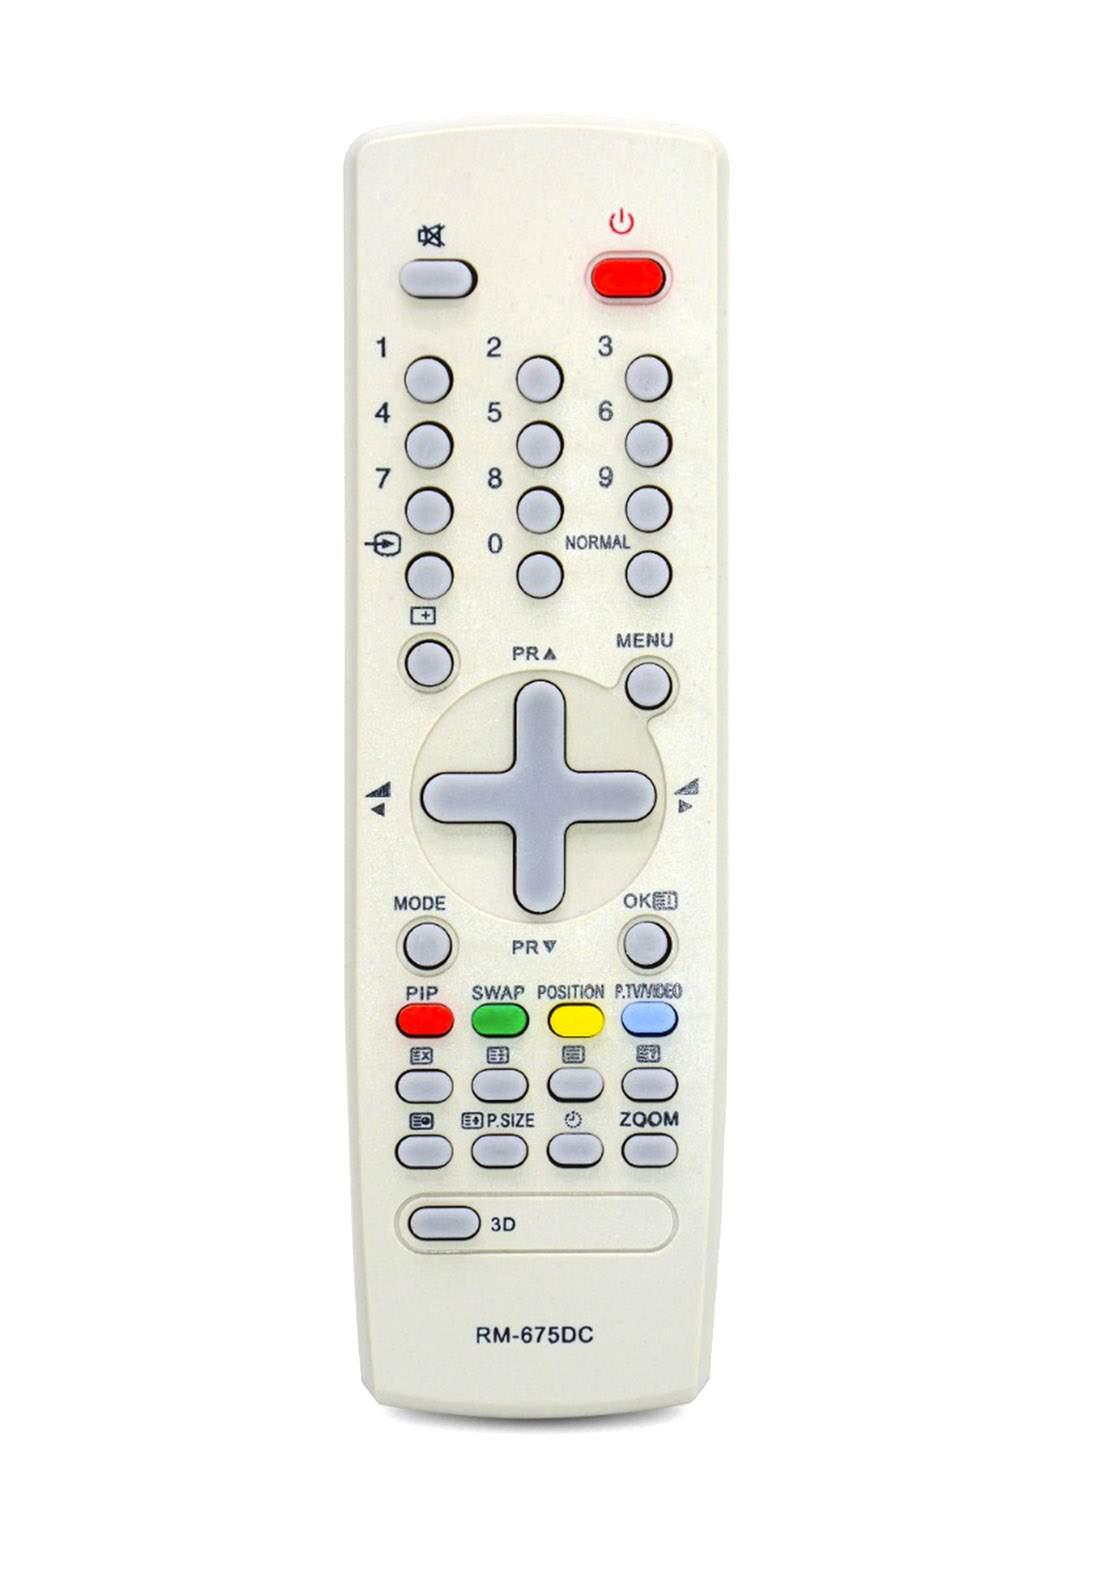 Universal Remote Control For Daewoo TV - White جهاز التحكم عن بعد